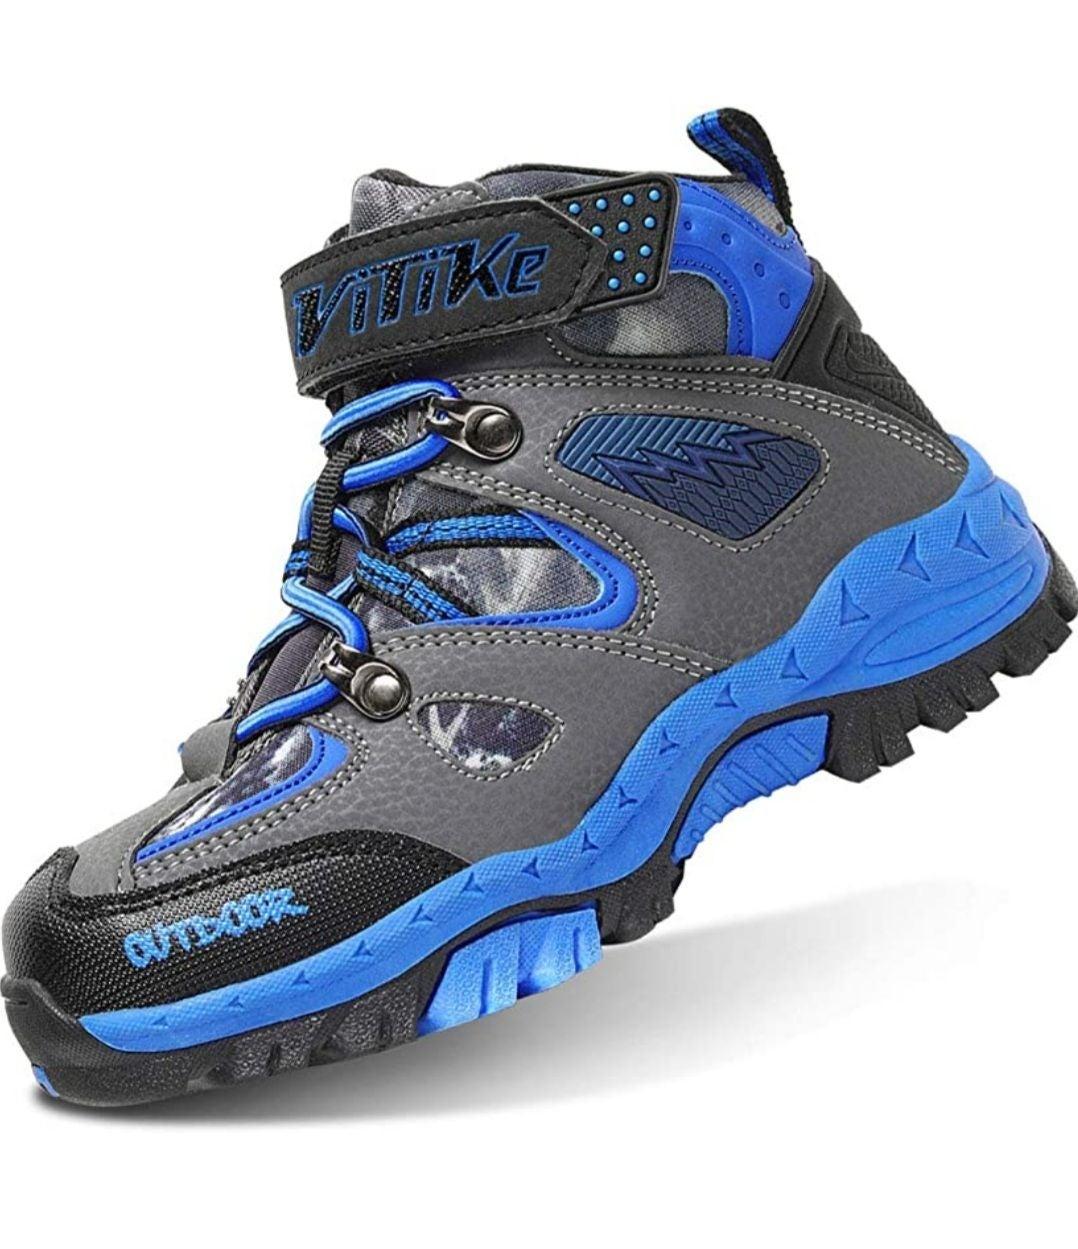 Vitike kids outdoors hiking boots size 4